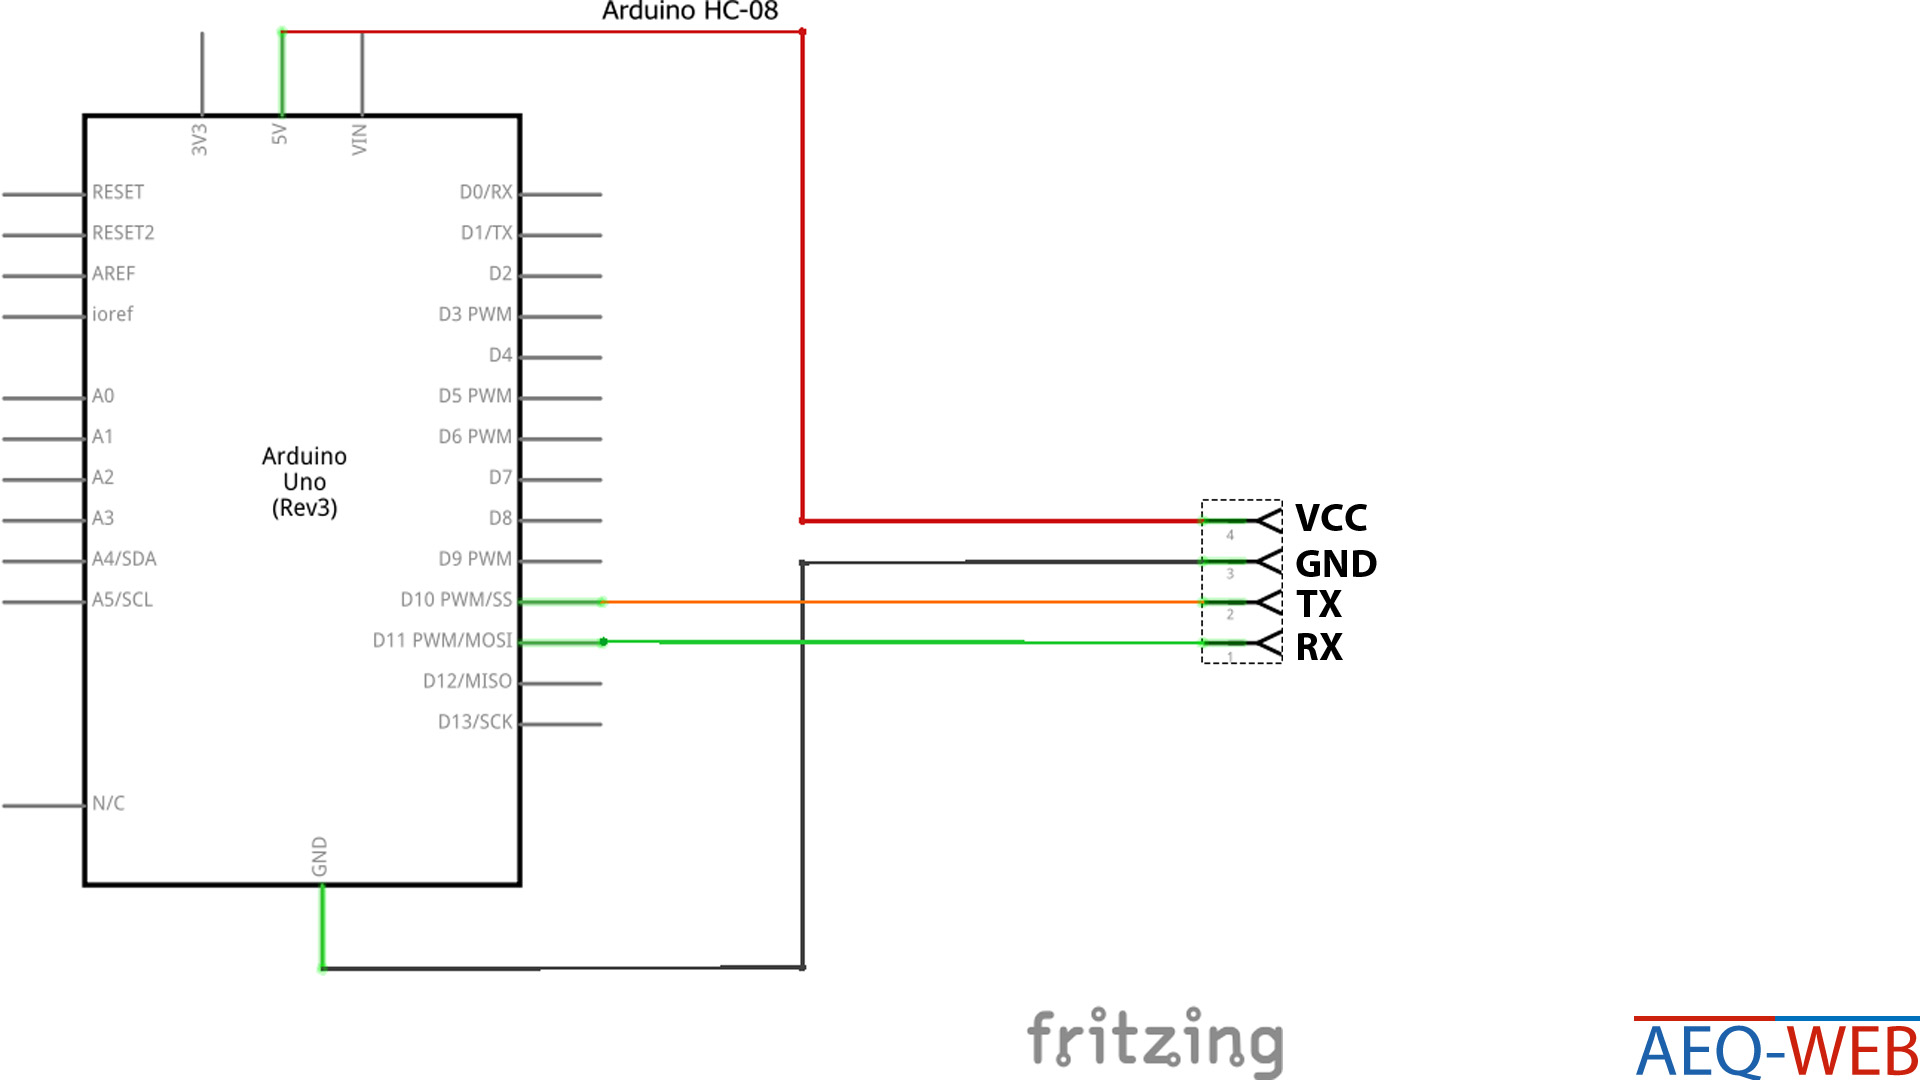 Arduino HC-08 Bluetooth Module - AEQ-WEB COM